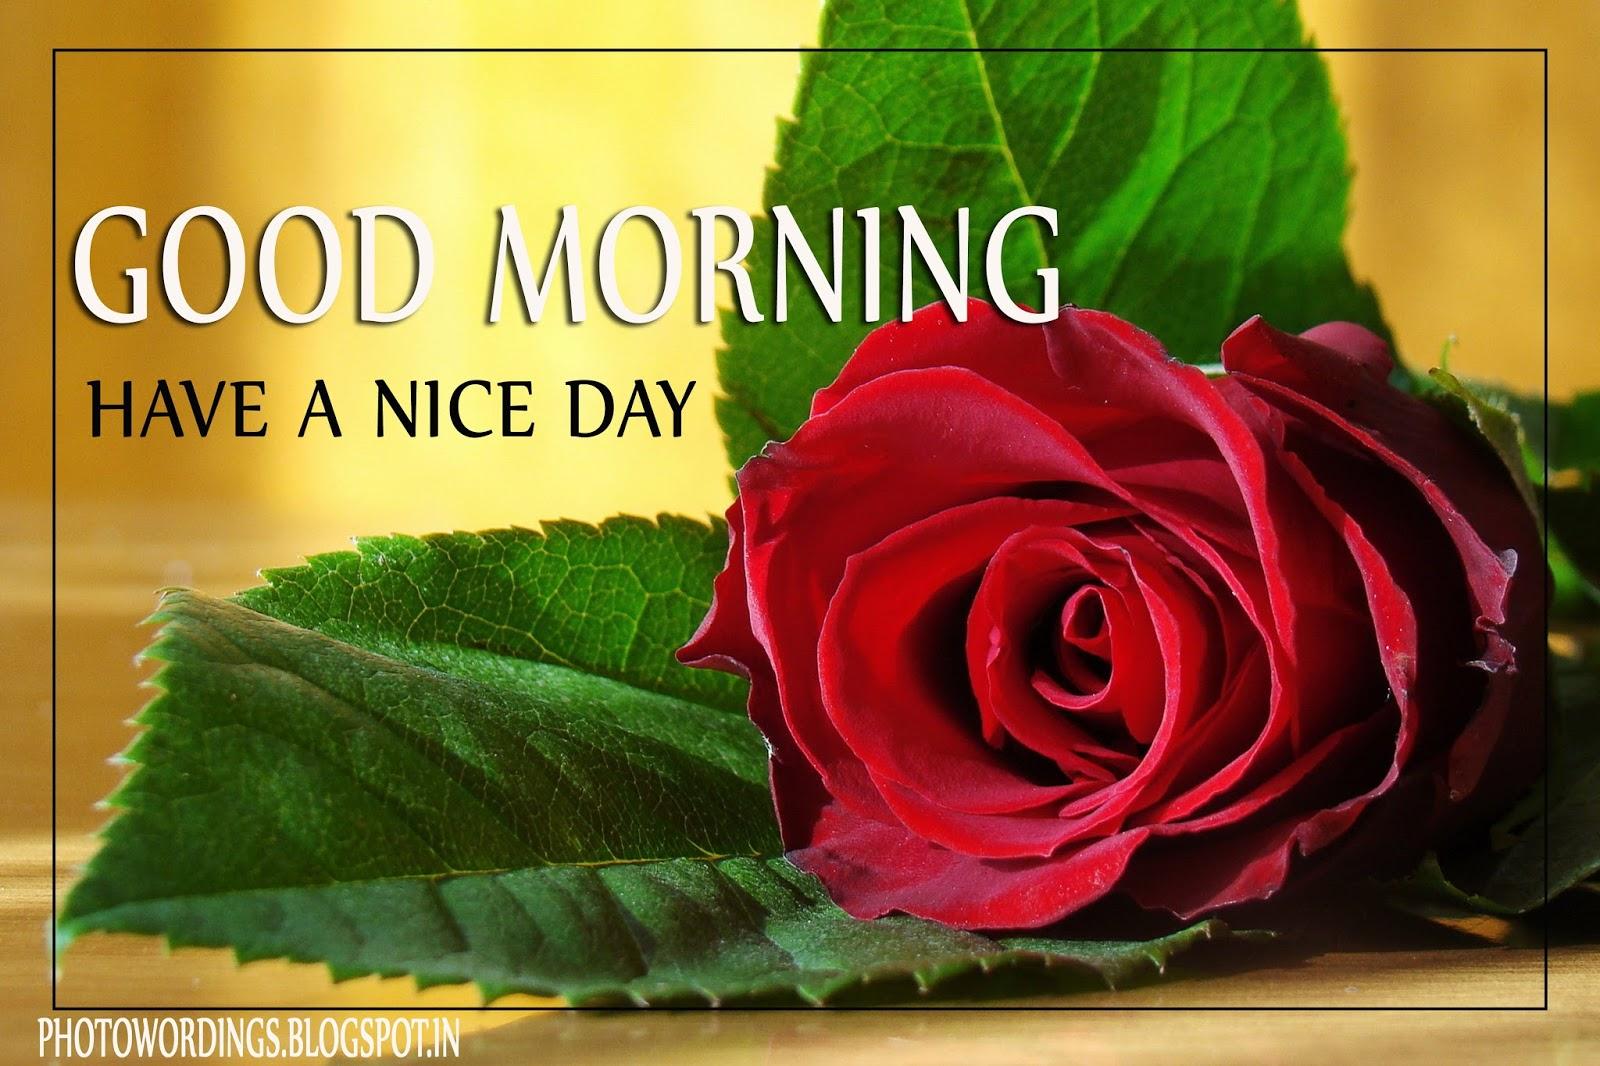 Good Morning Love Flower Image : Beautiful flower love good morning photo wordings